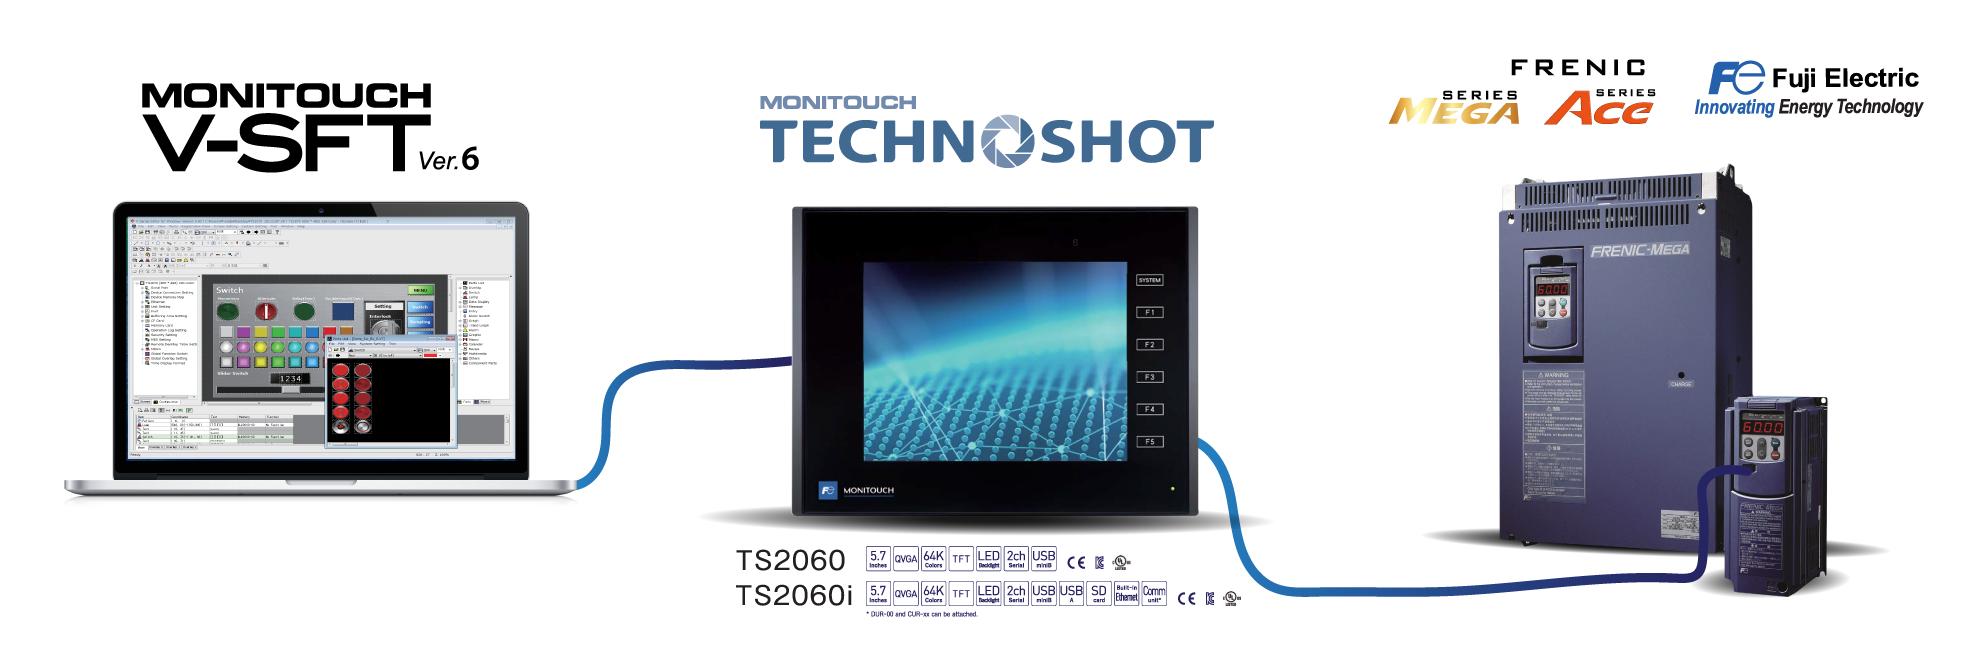 MONITOUCH Software V-SFT - ตัวแทนจำหน่าย Fuji Electric ใน